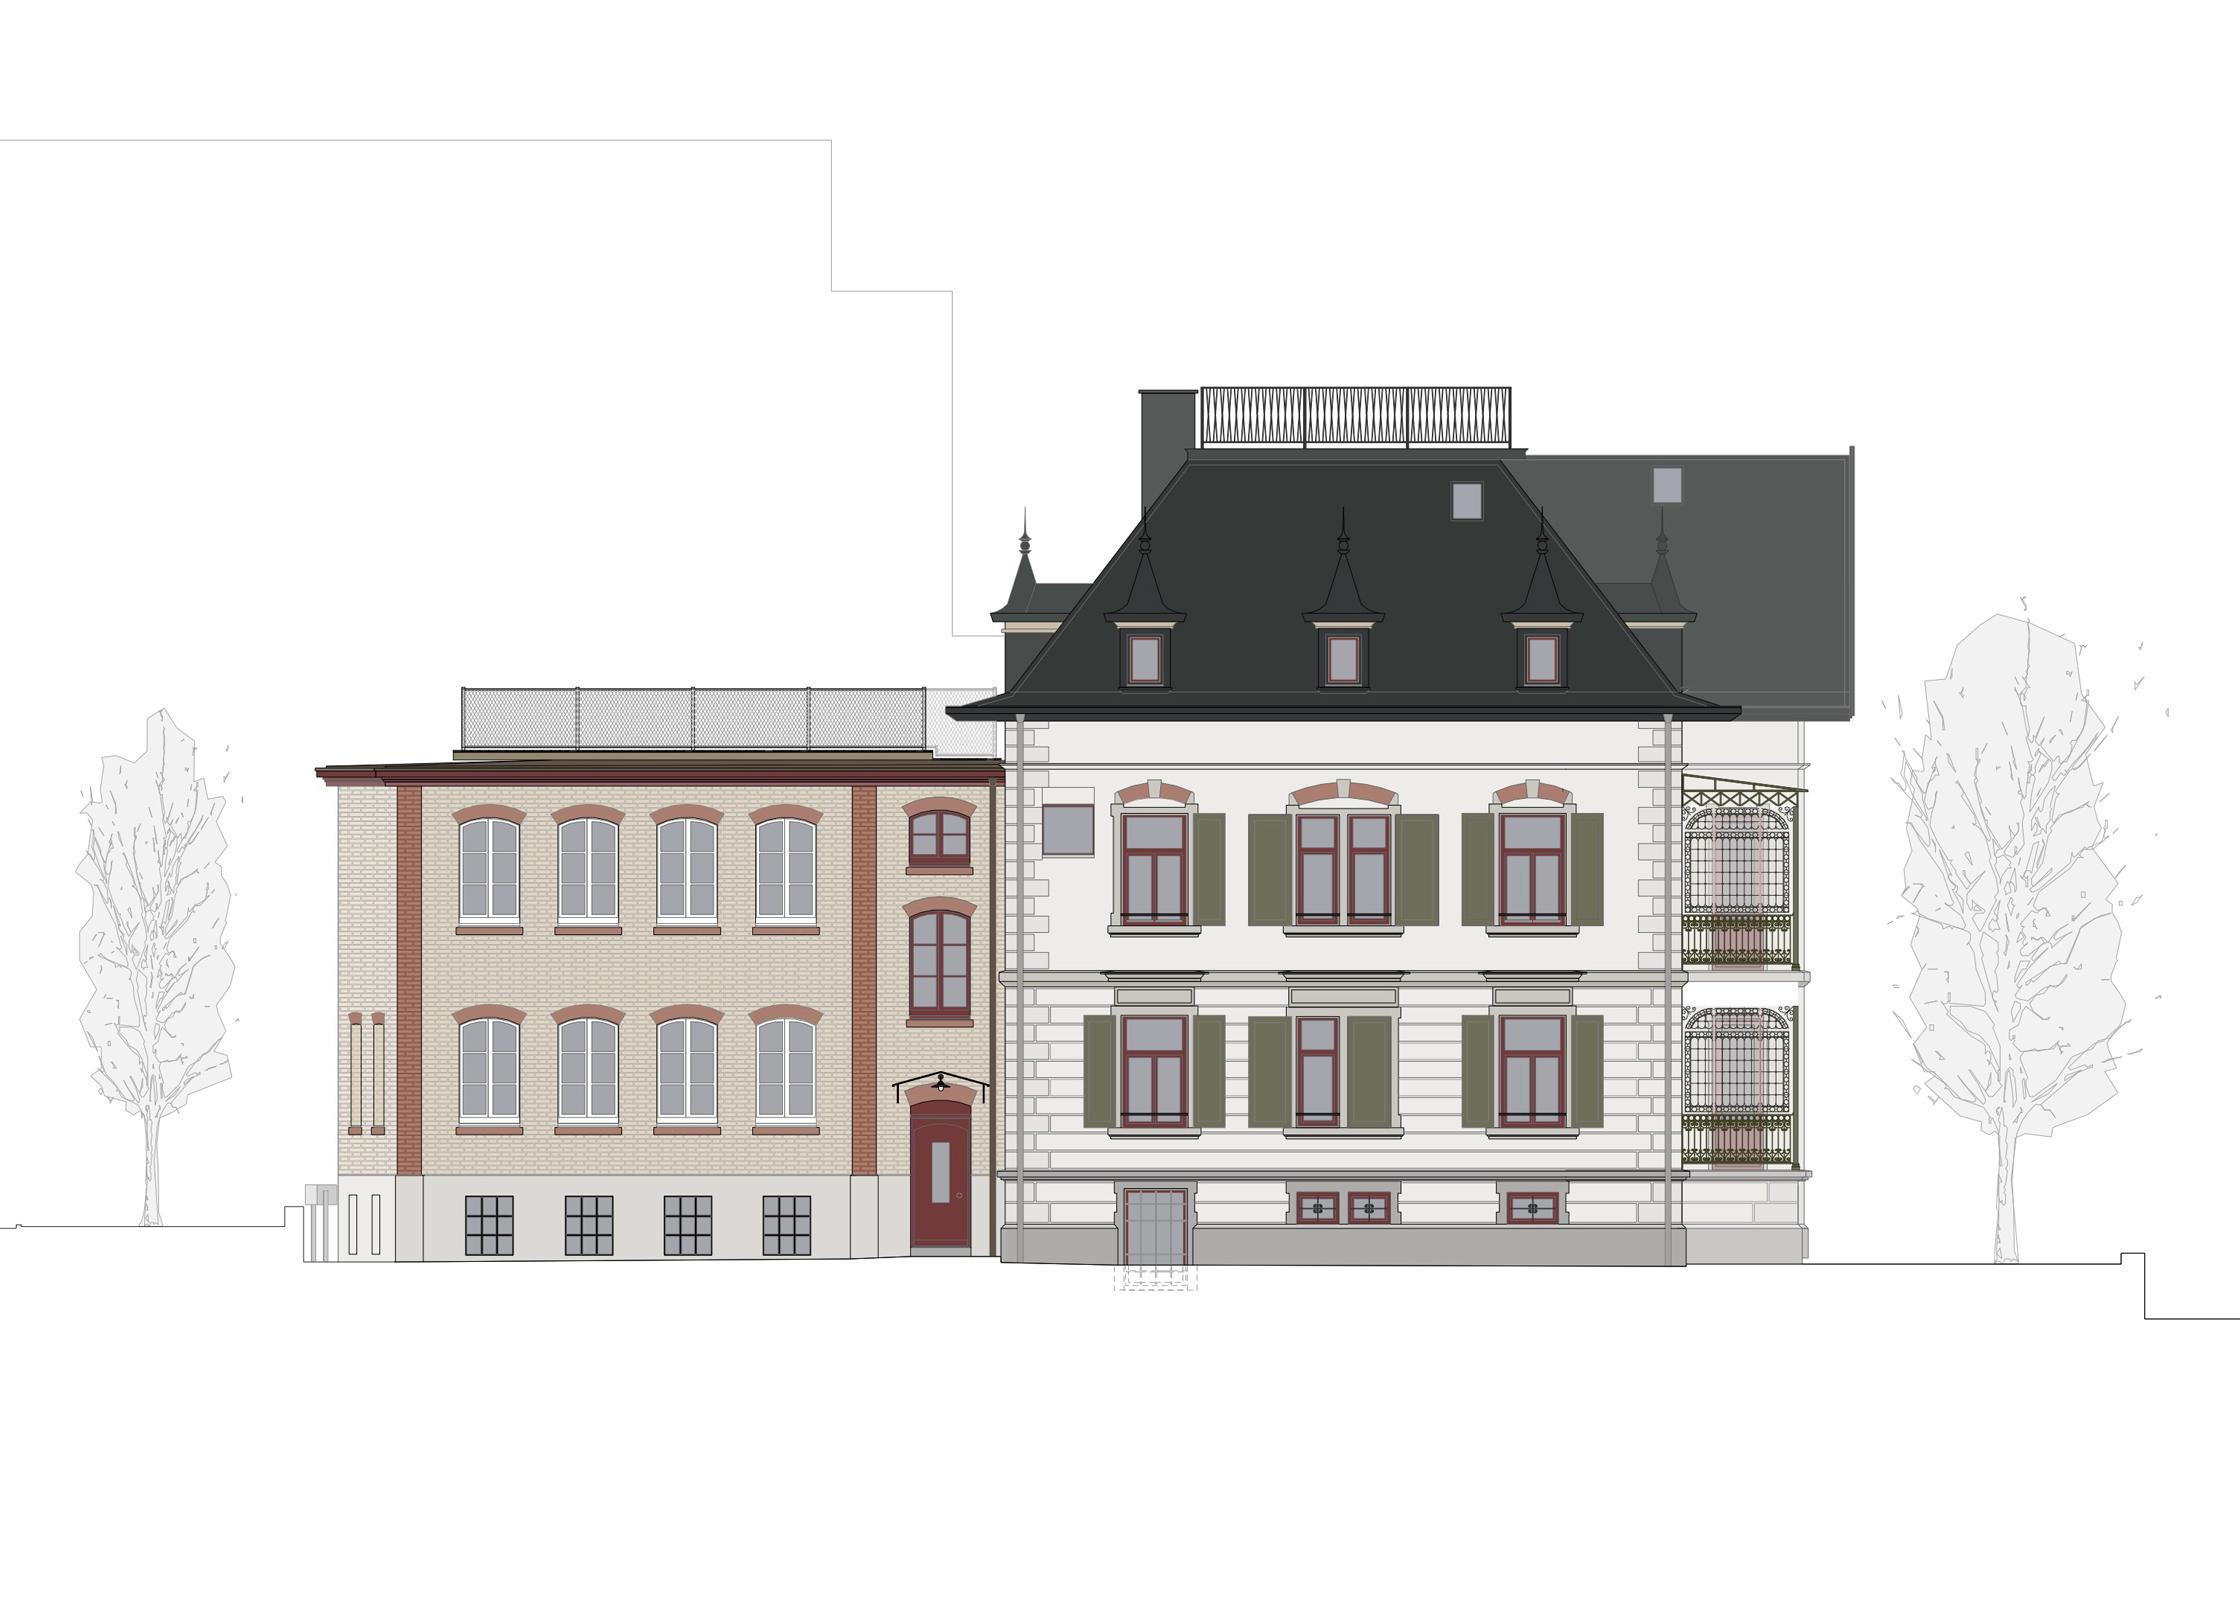 Villa Staub, Zug, Eggenspieler Architekten AG